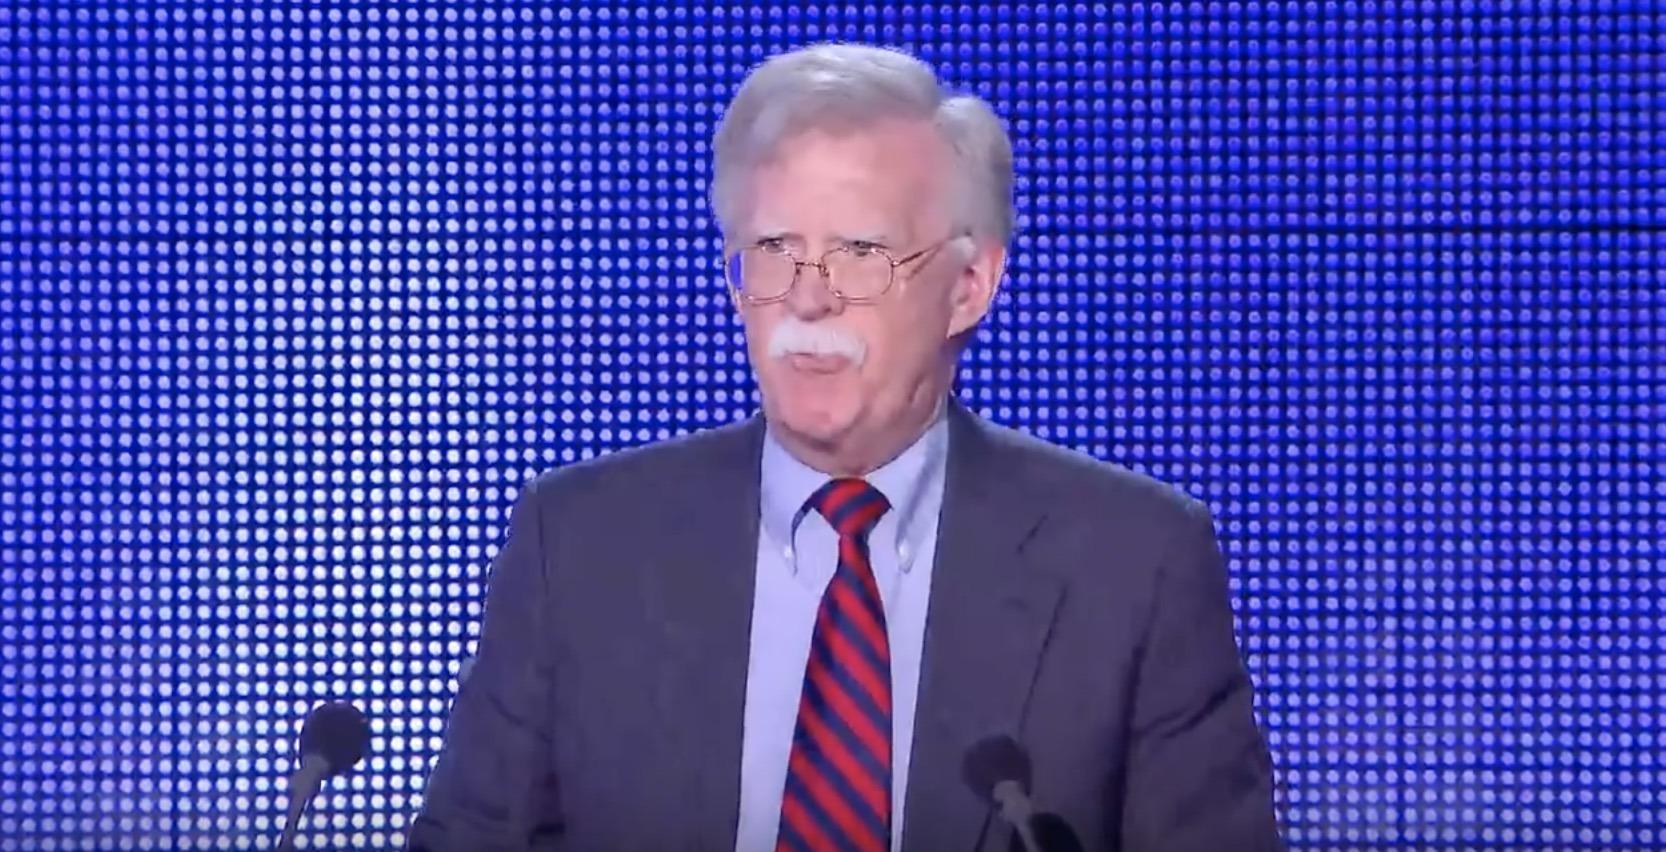 Liberty Links 4/1/18 – Madman John Bolton Advocated for Iran Regime Change in 2017 Speech